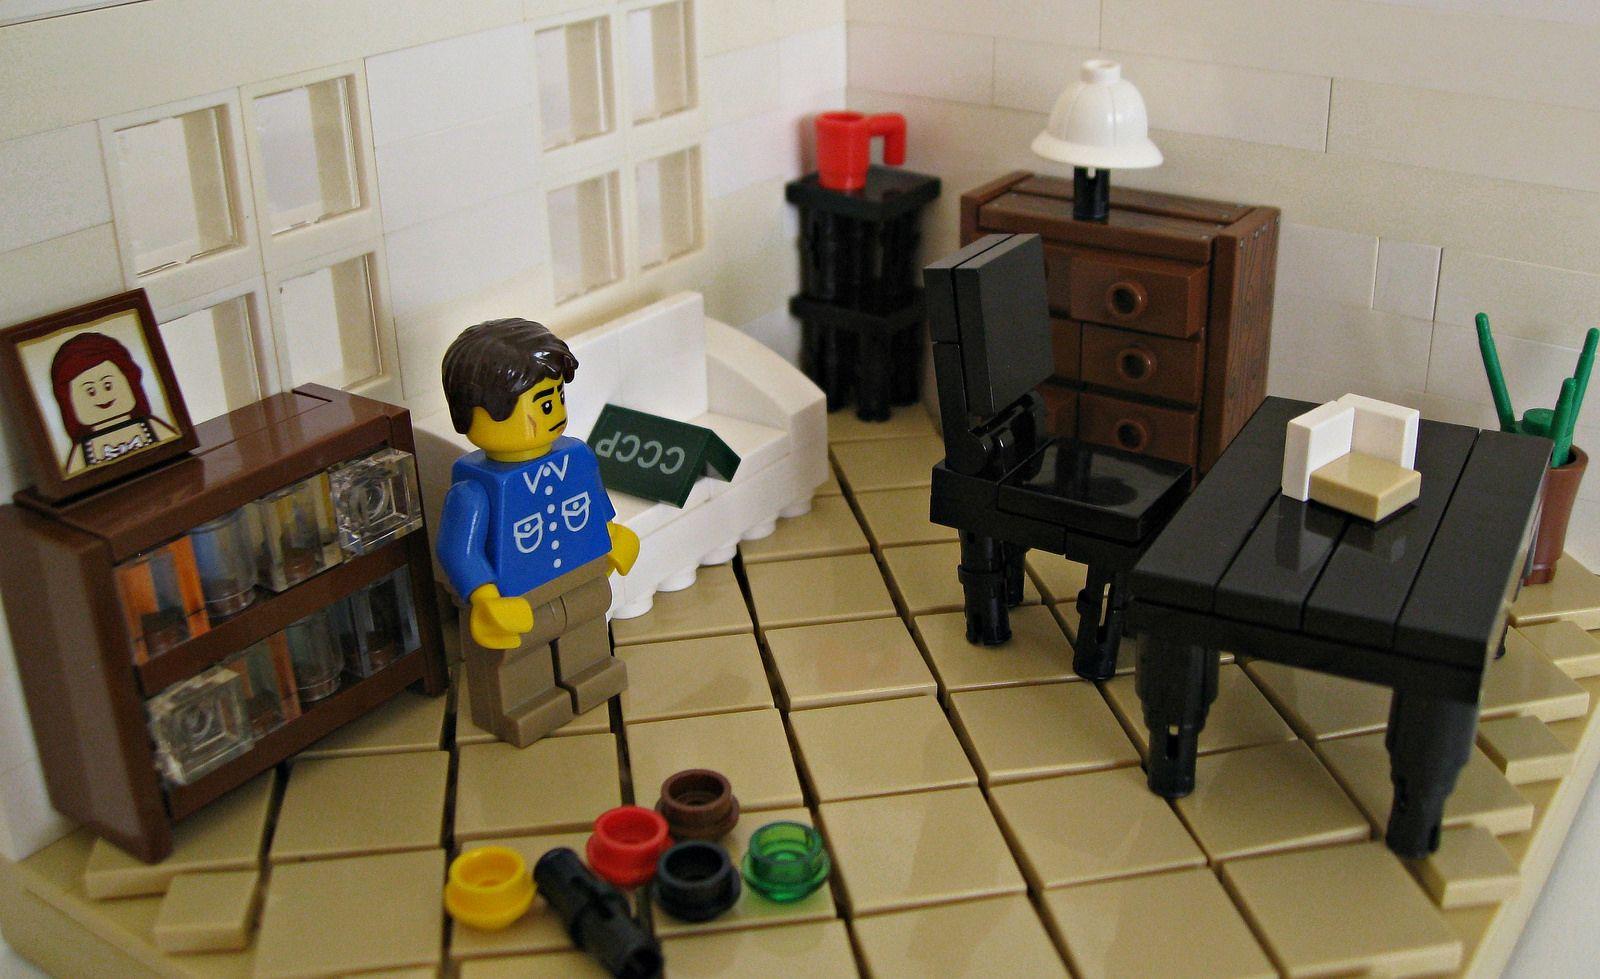 Lego Furniture Time To Build Lego Lego Furniture And Lego Stuff